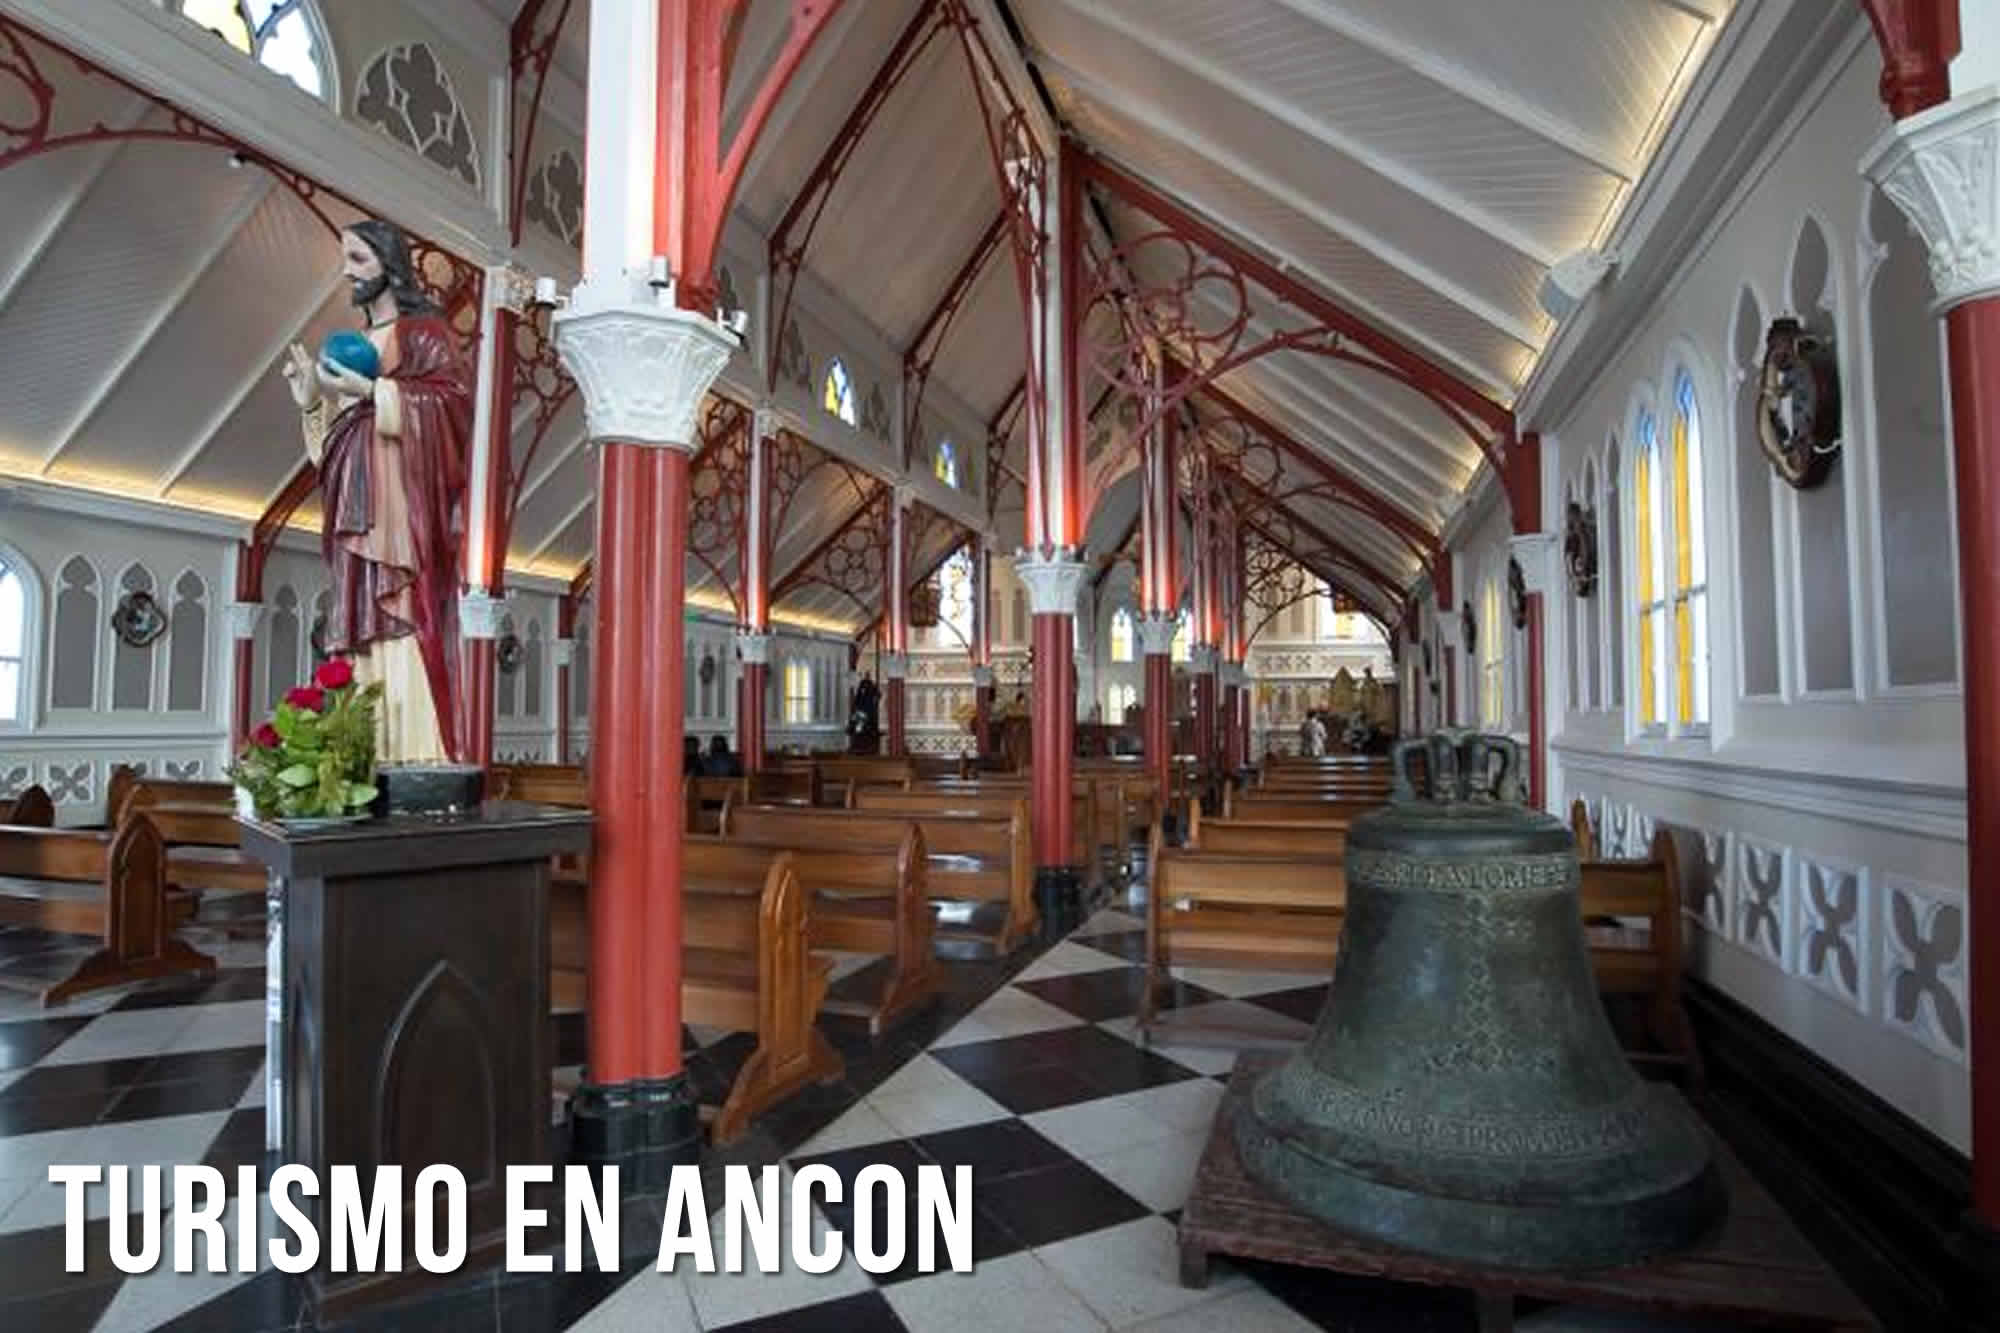 TURISMO EN ANCON | IGLESIA DE SAN MARCOS